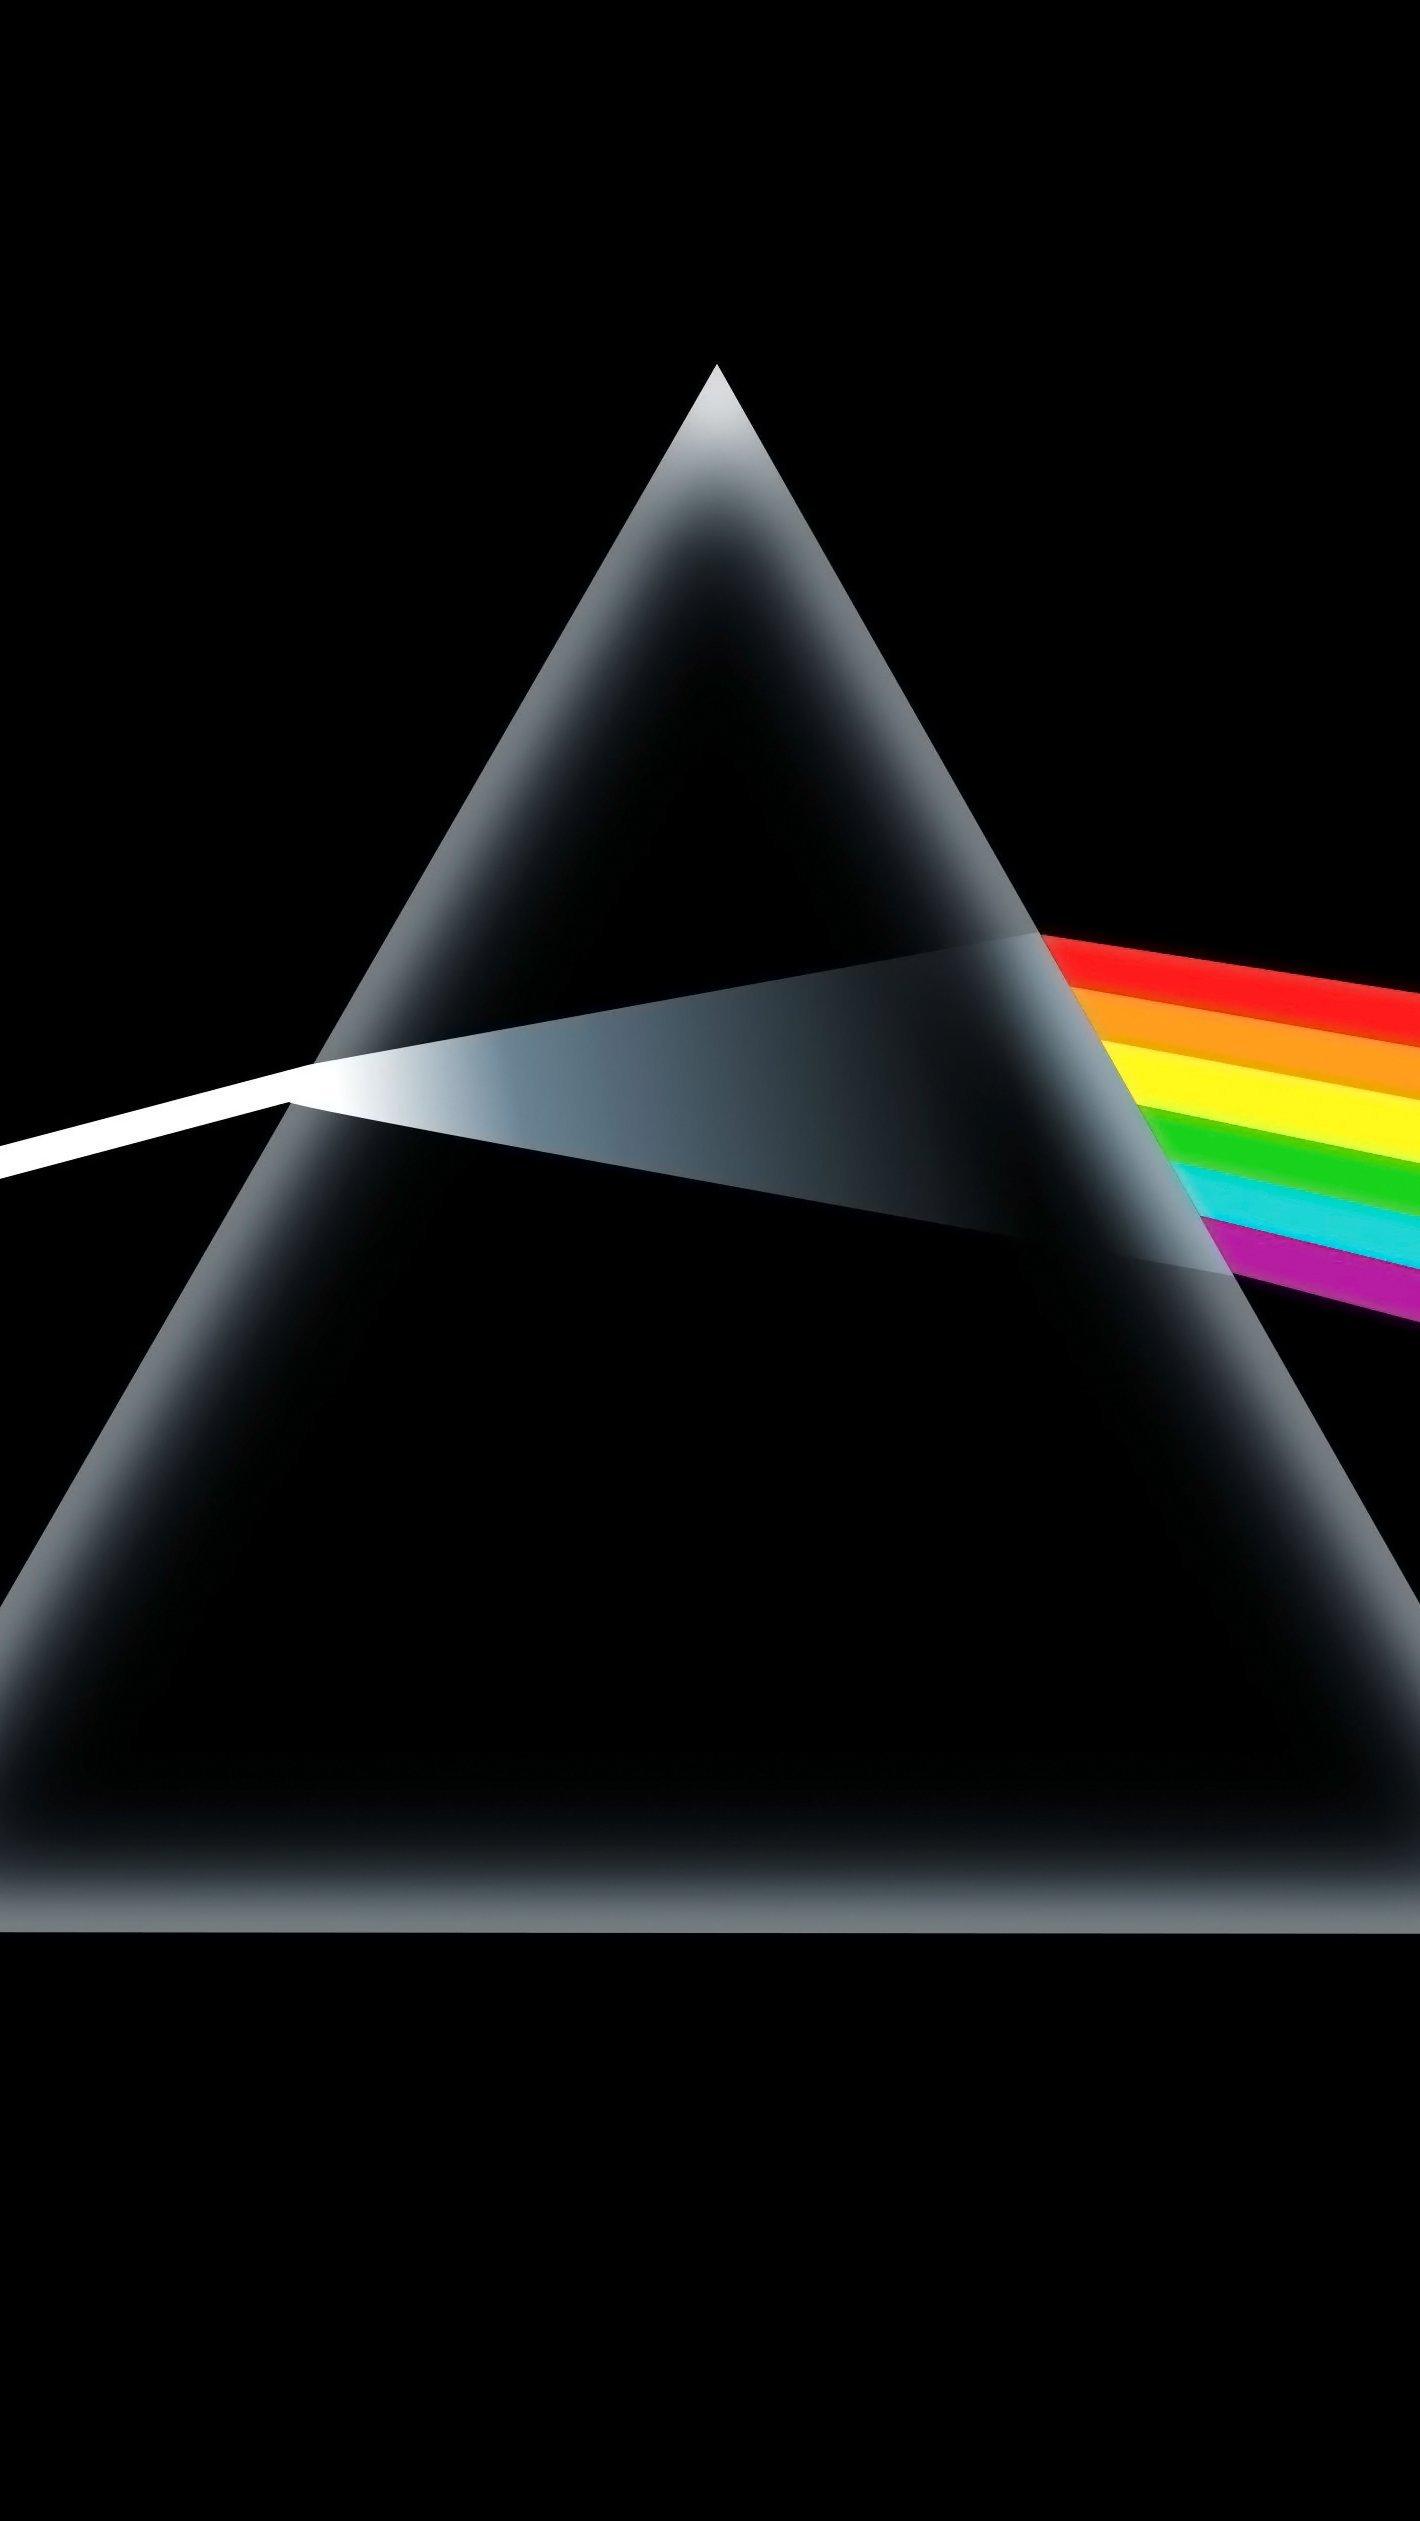 Wallpaper Pink Floyd - The Dark Side of the Moon Vertical